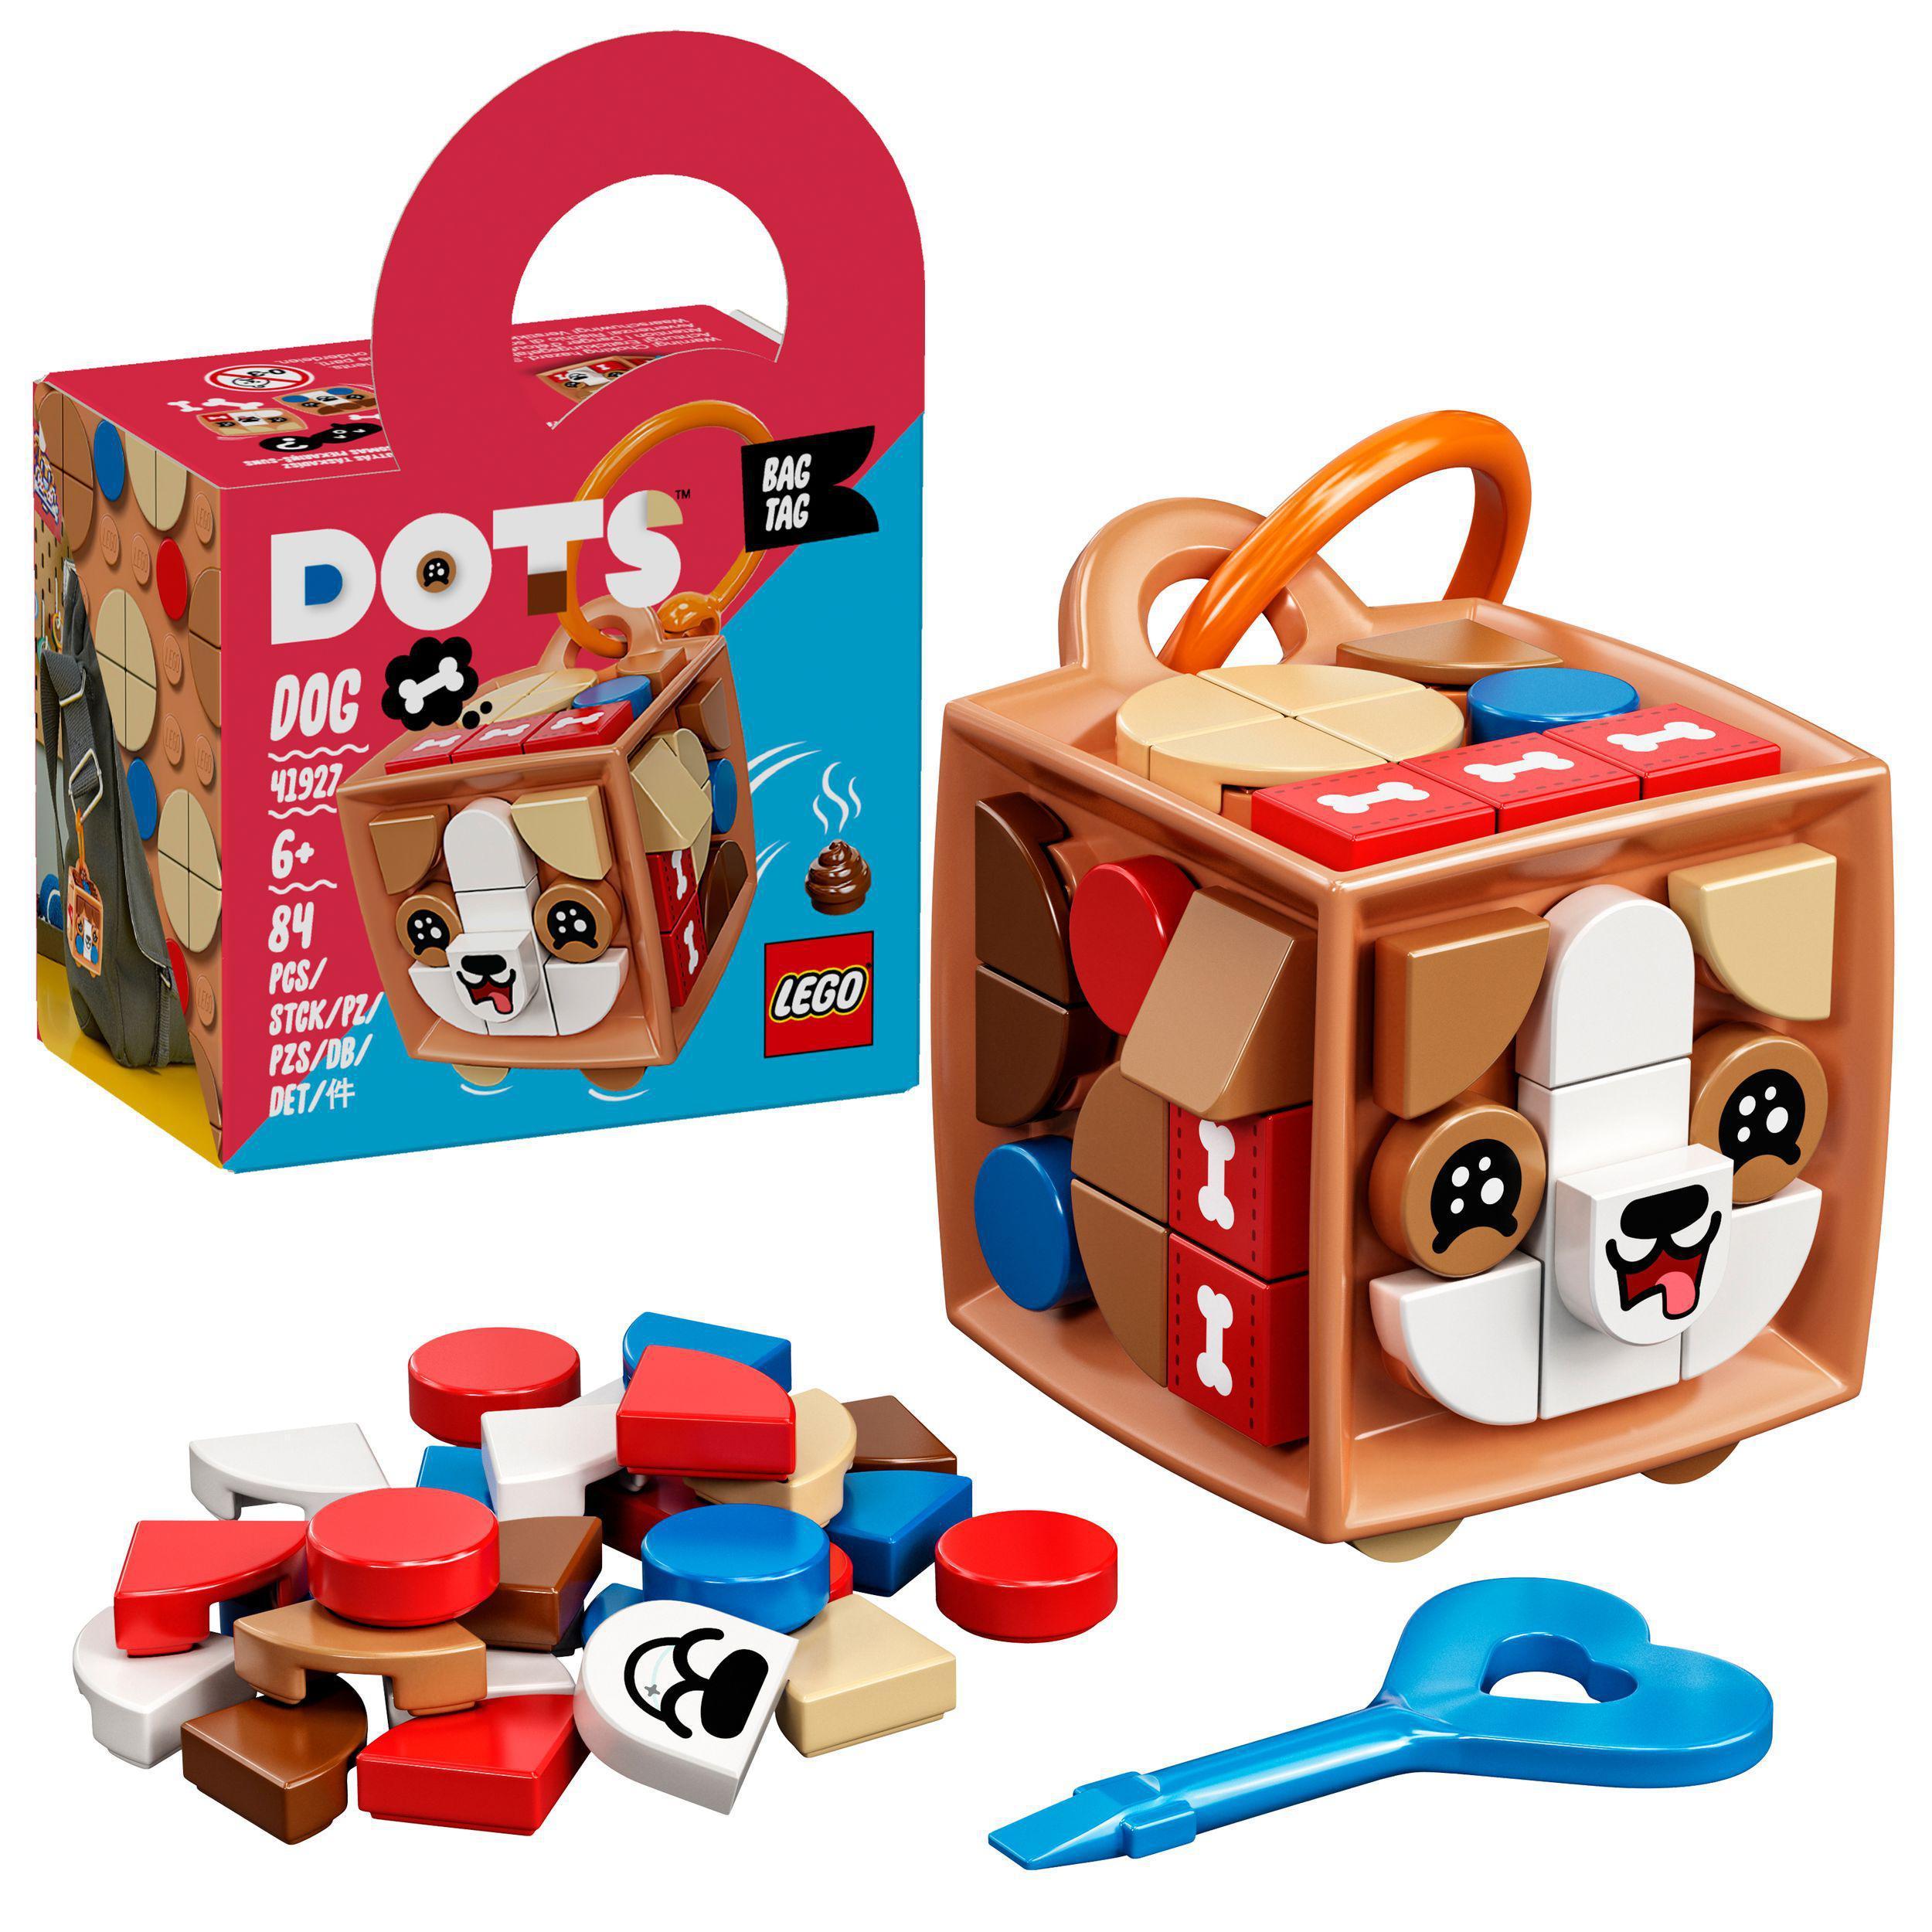 LEGO DOTS - Bag Tag Dog (41927)